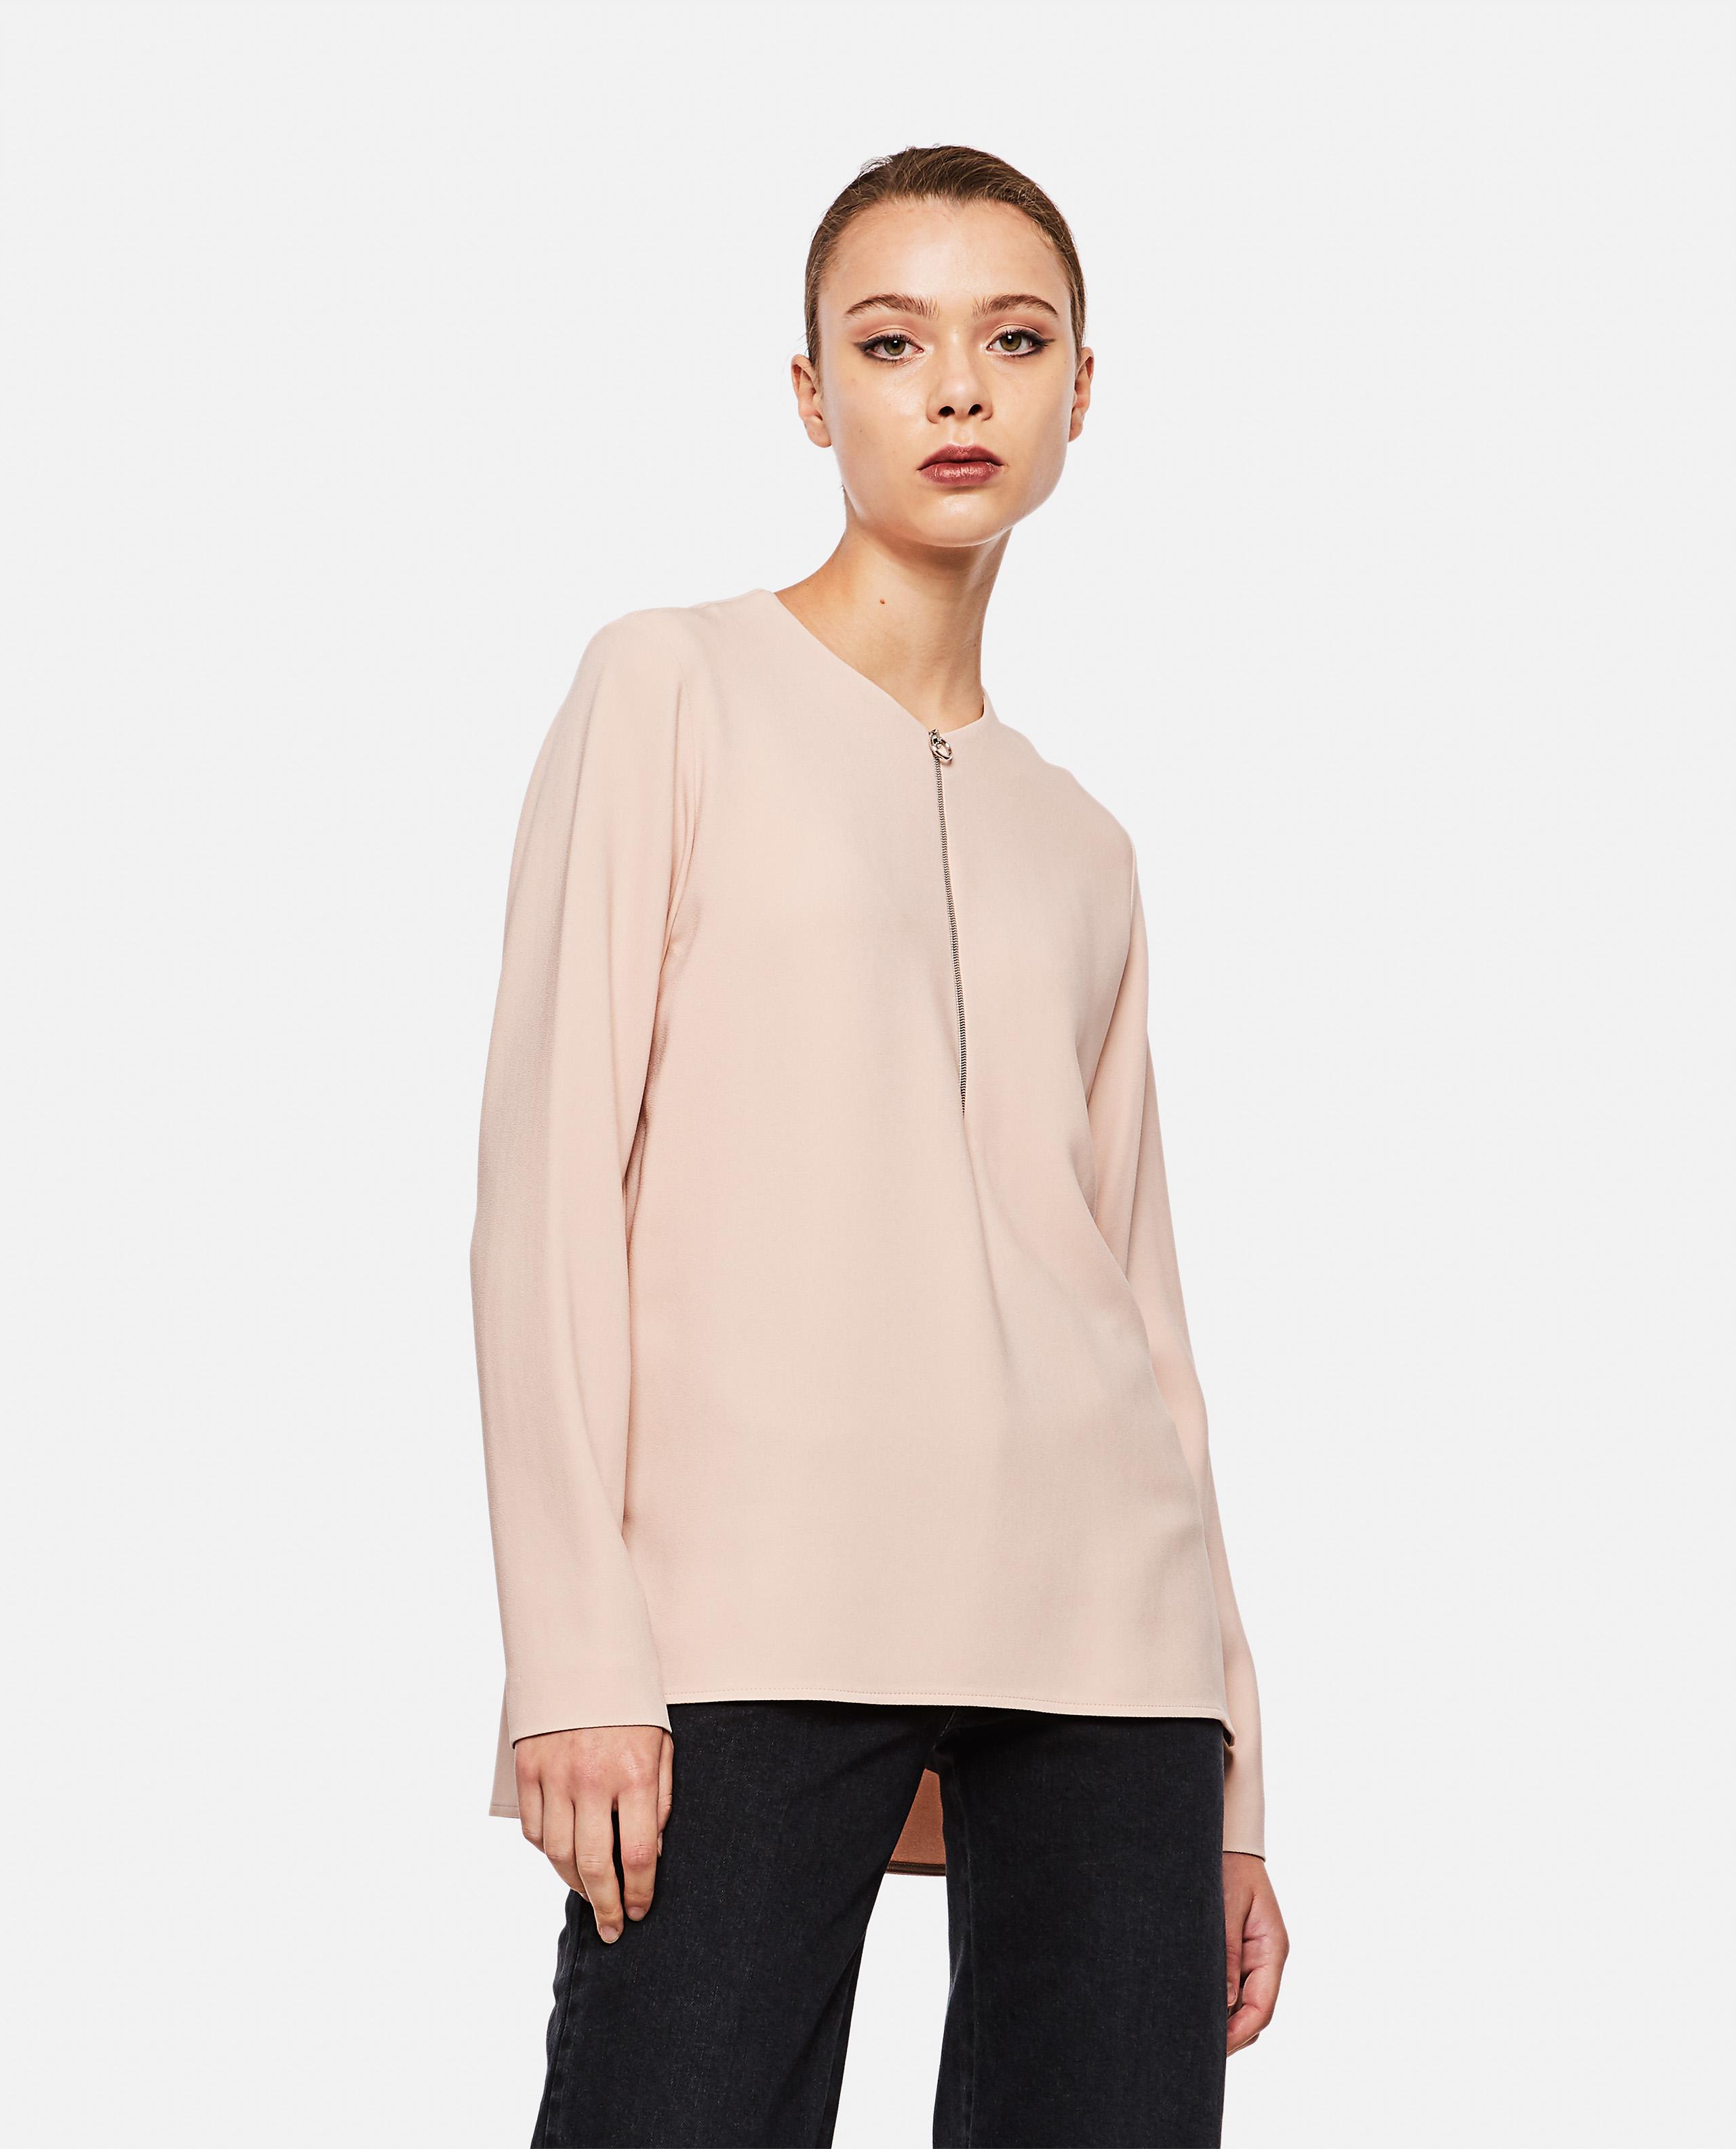 Arlesa sweater